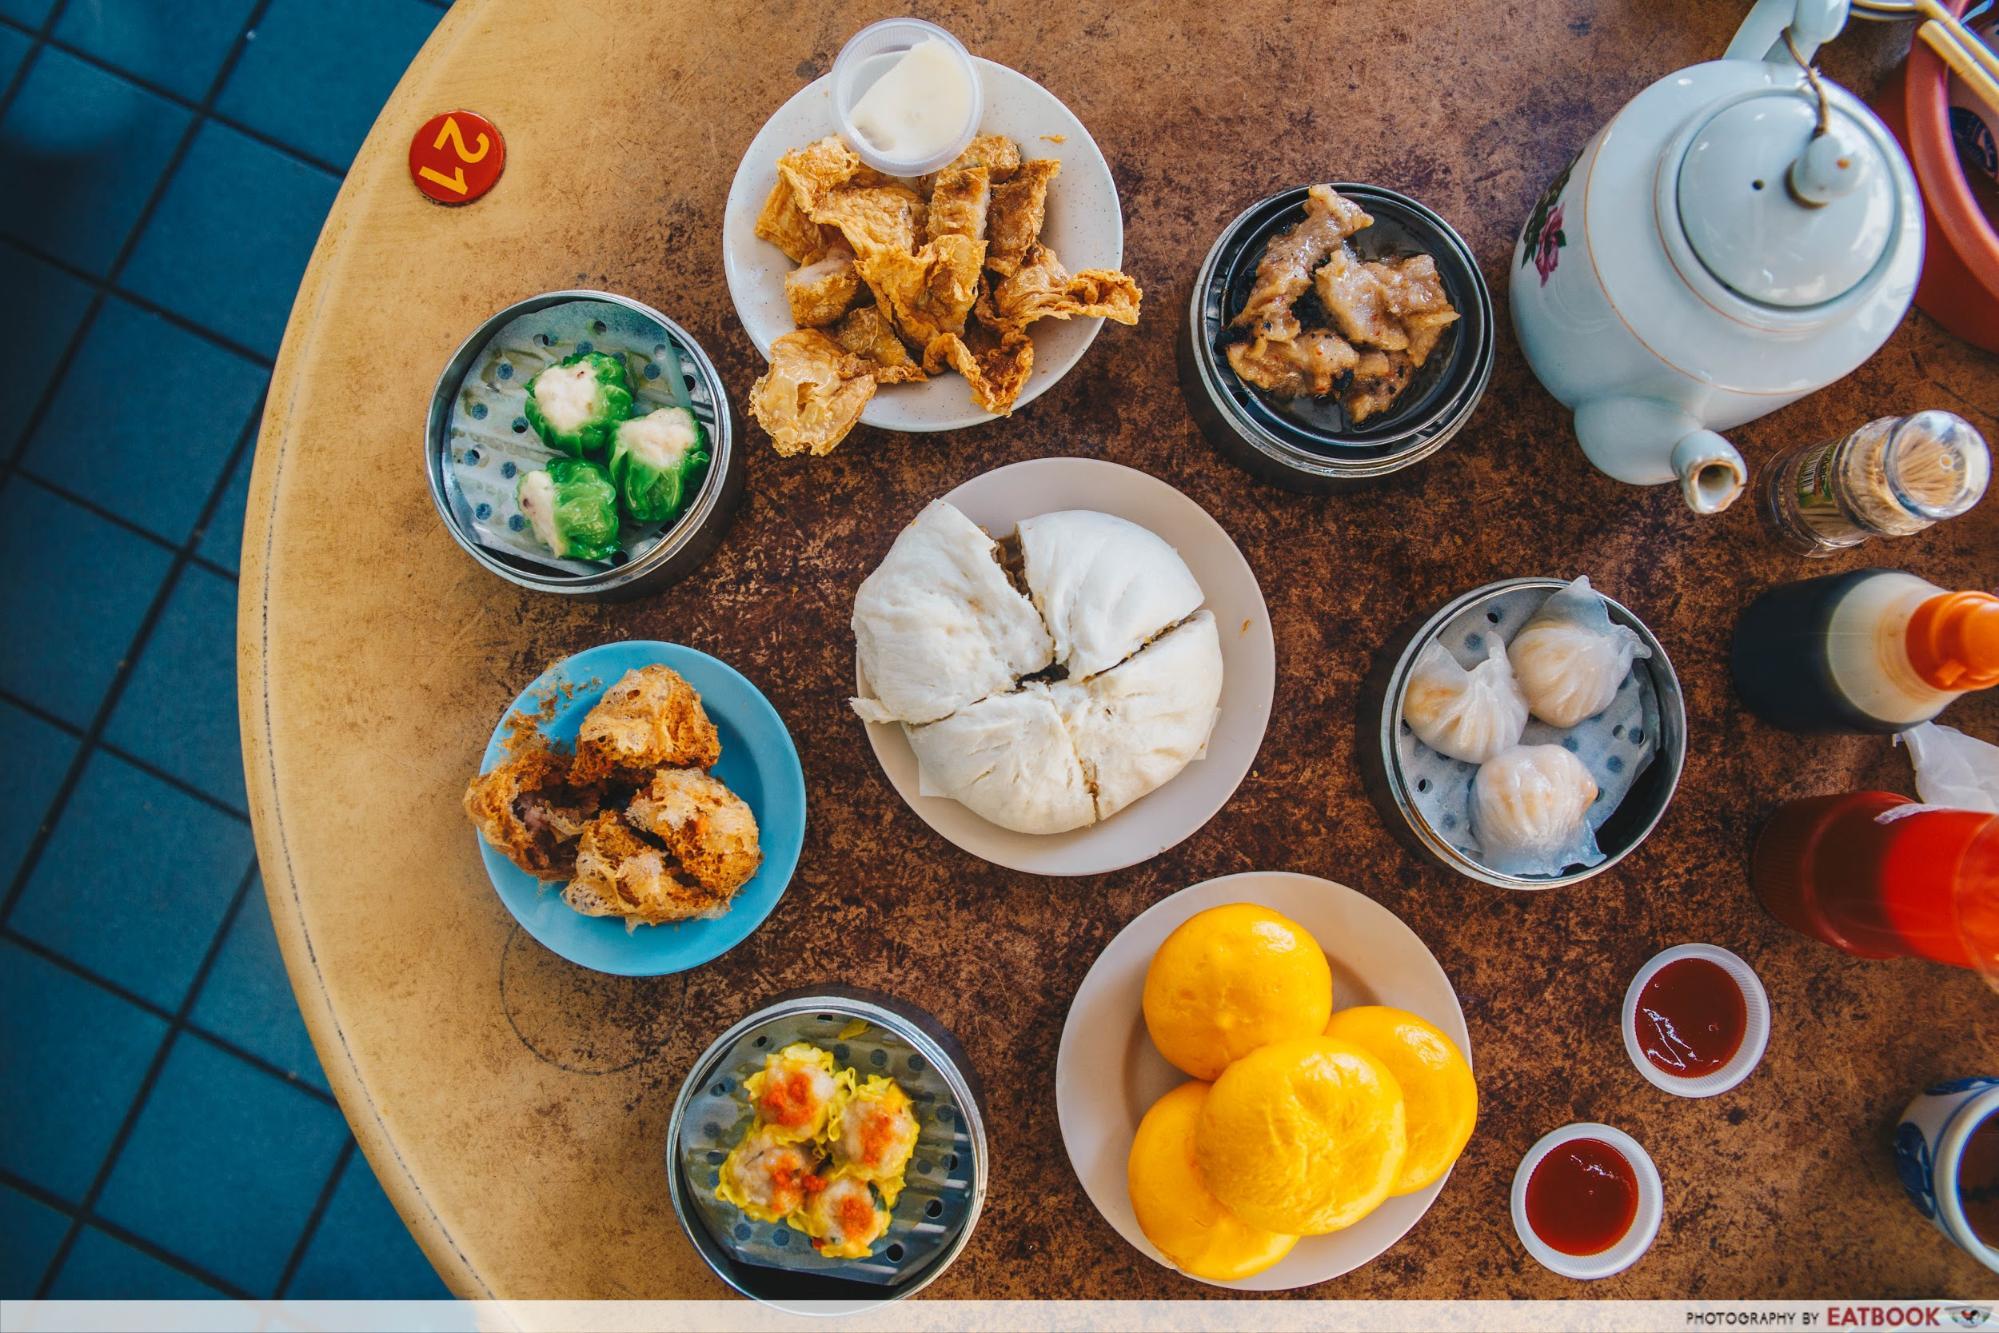 Penang Hawker Food - De Tai Tong Cafe dim sum